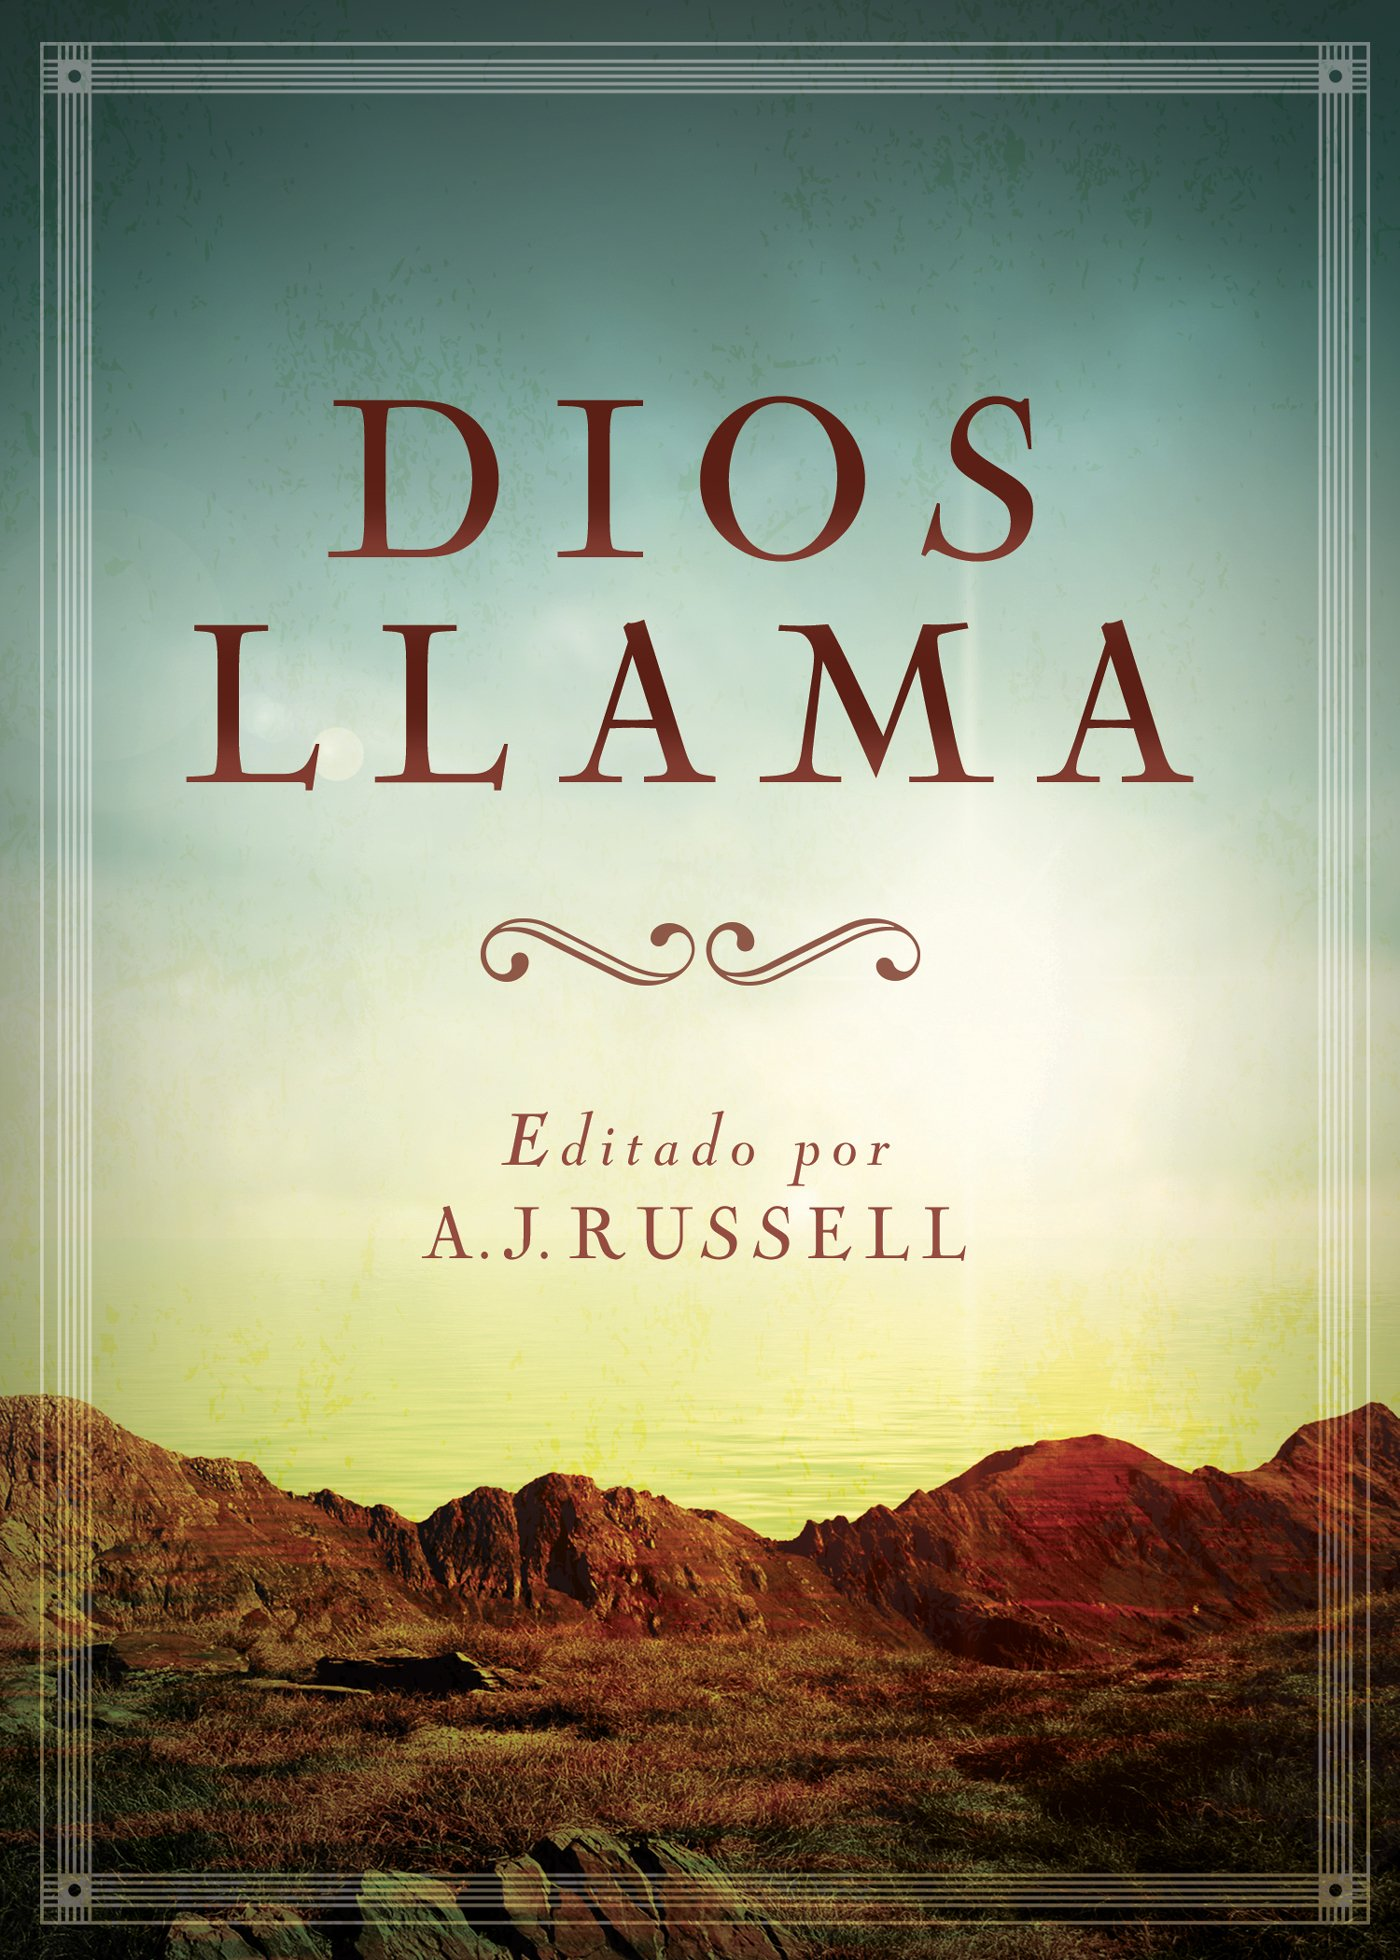 Dios Llama (Spanish Edition) (Spanish) Paperback – November 1, 2015